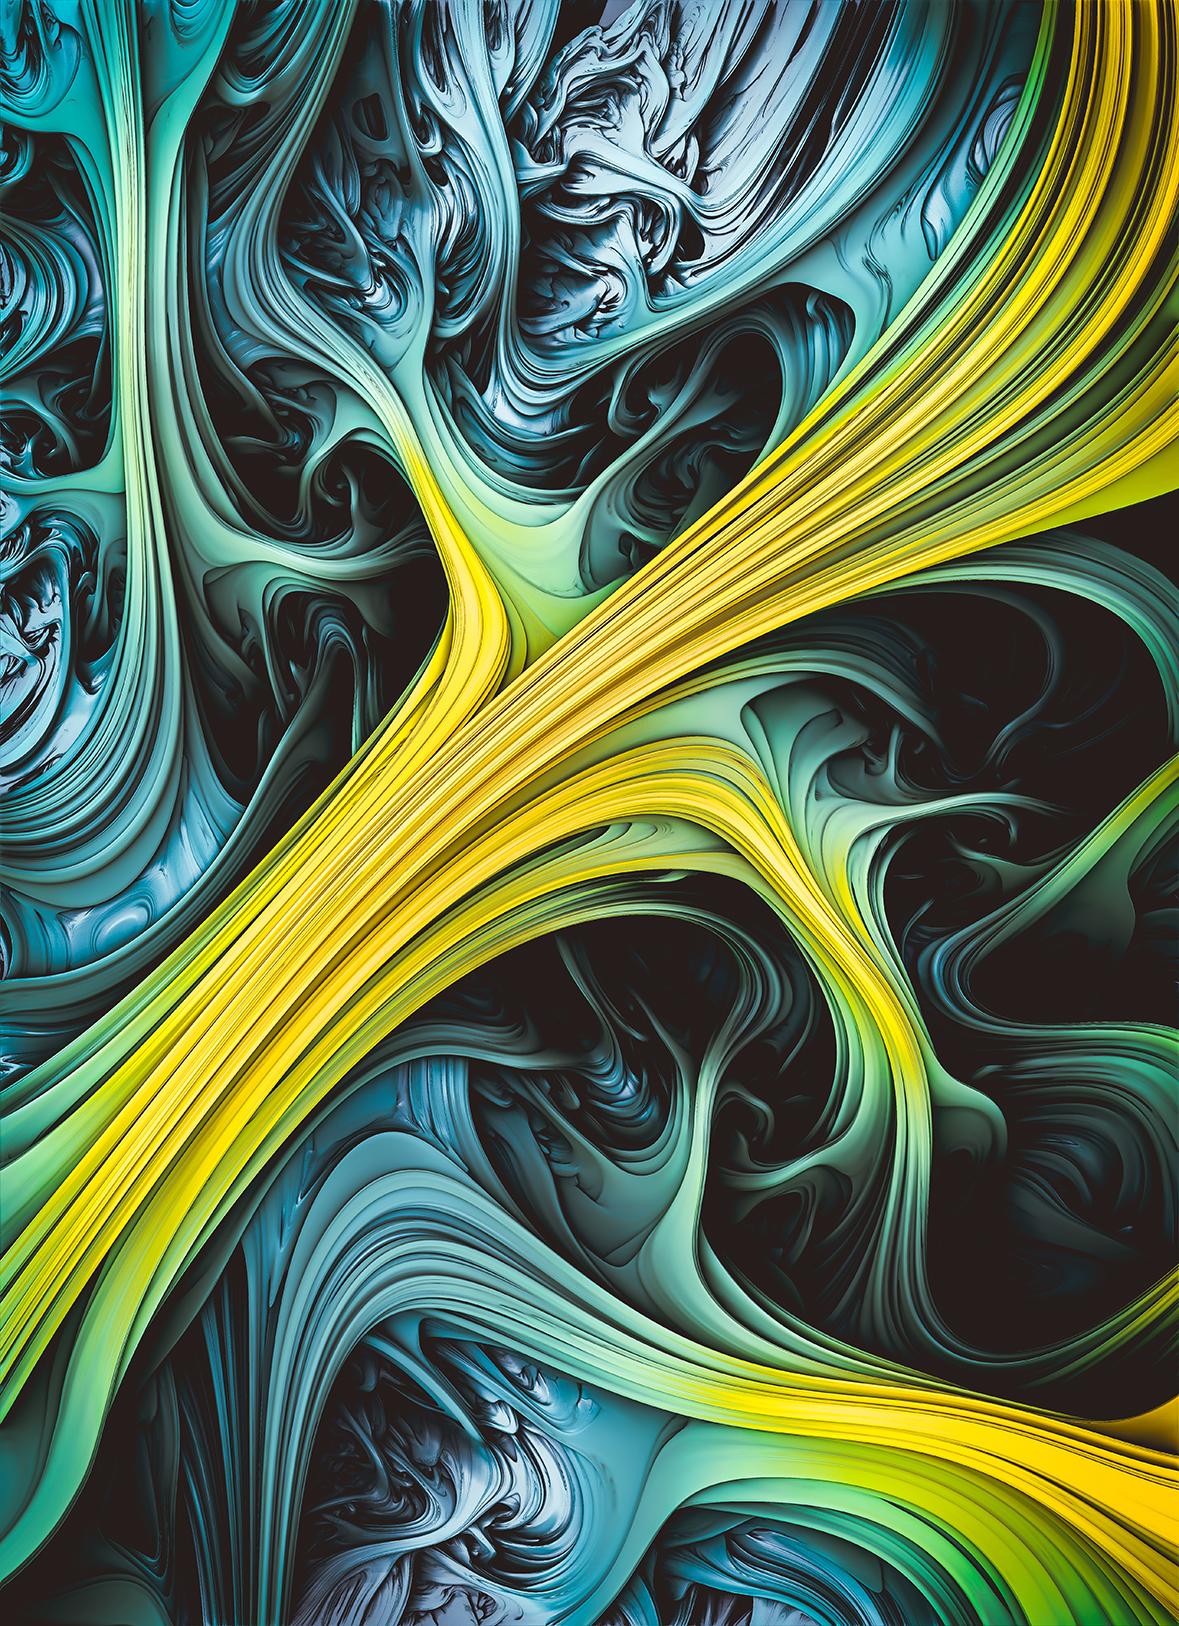 Tundara. Abstract Art by Stephen Geisel, luv-fi.com